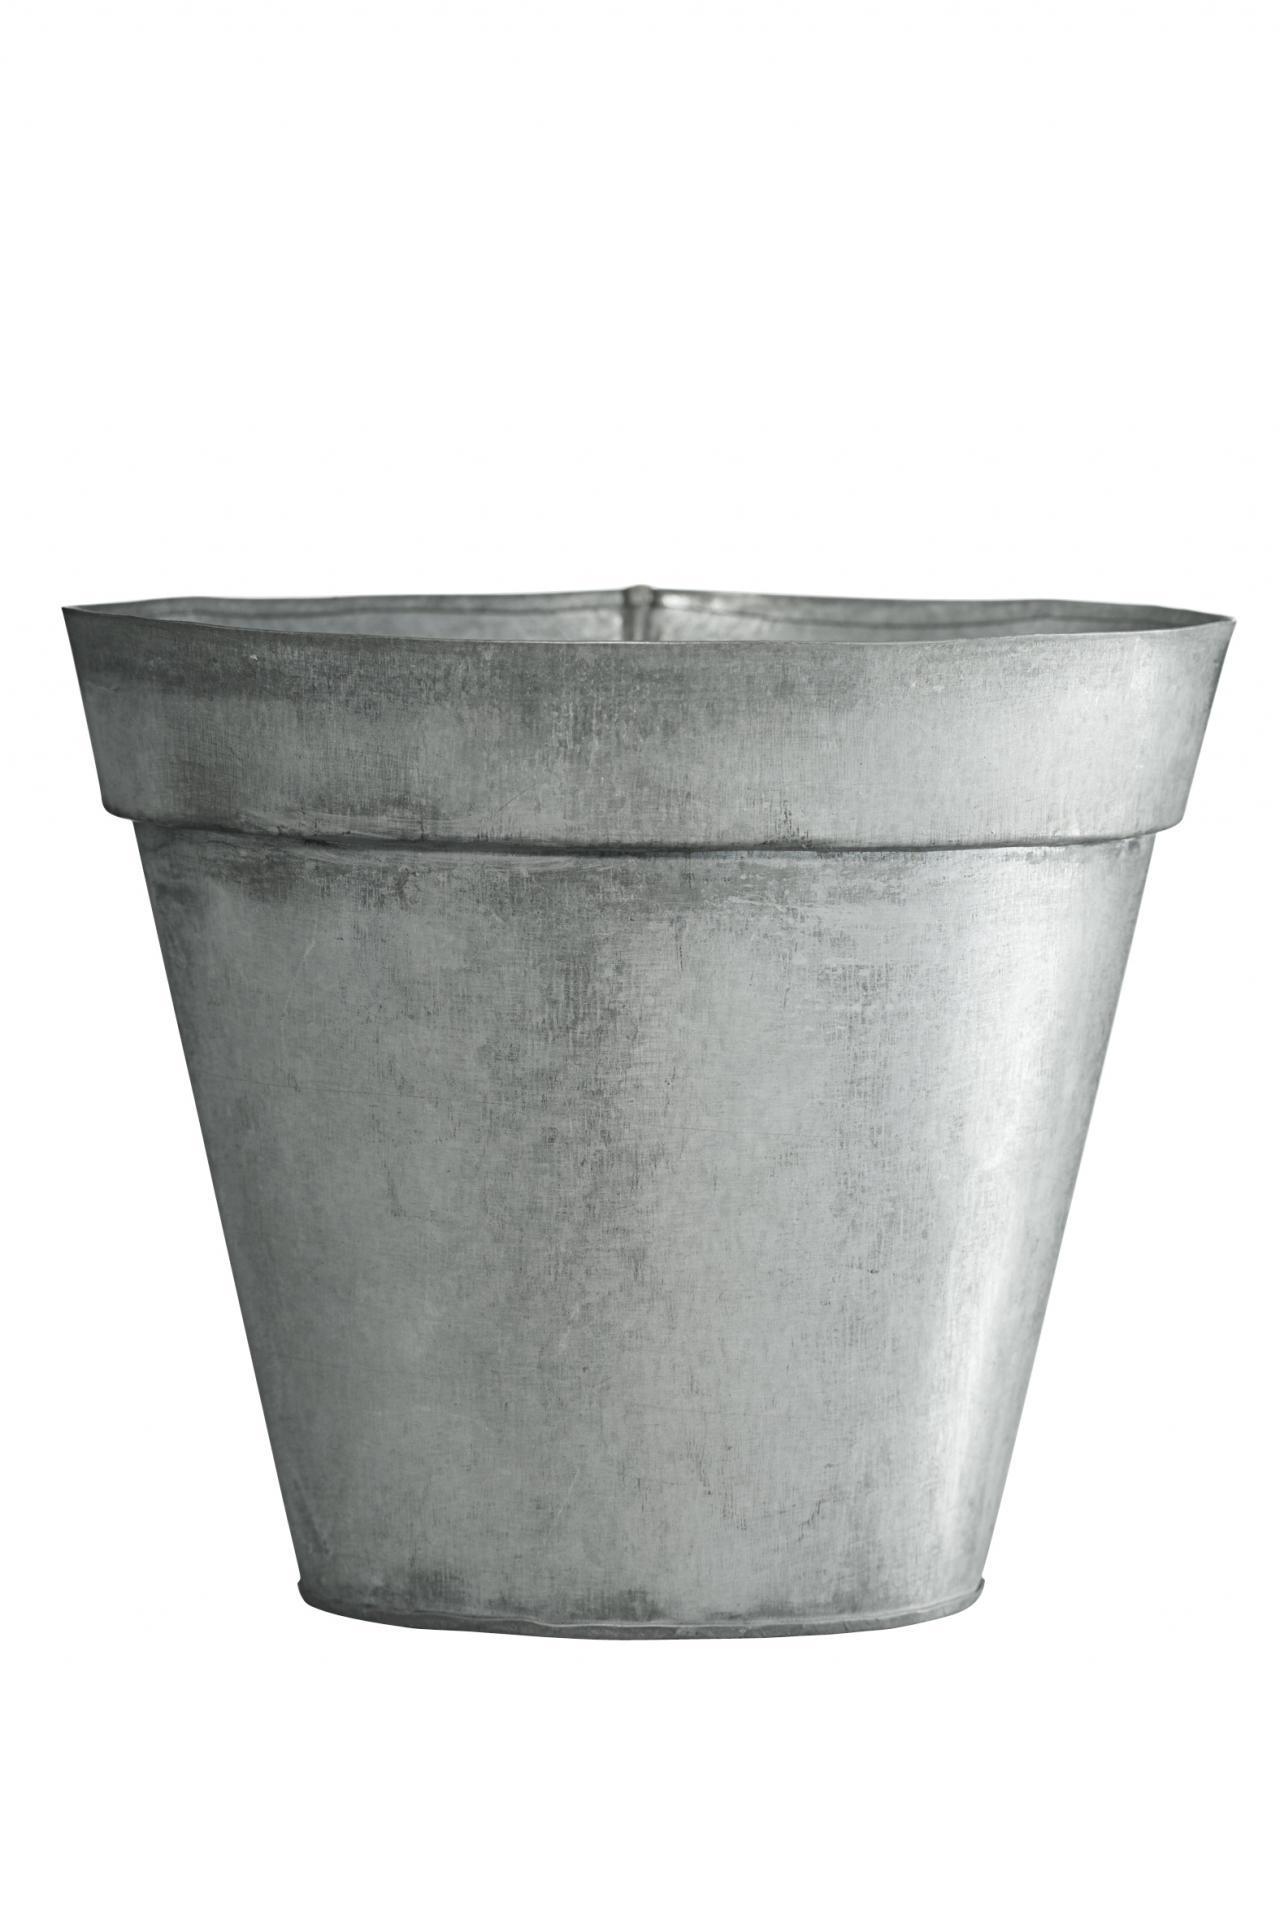 MADAM STOLTZ Obal na květiny Zinc 13 cm, šedá barva, zinek